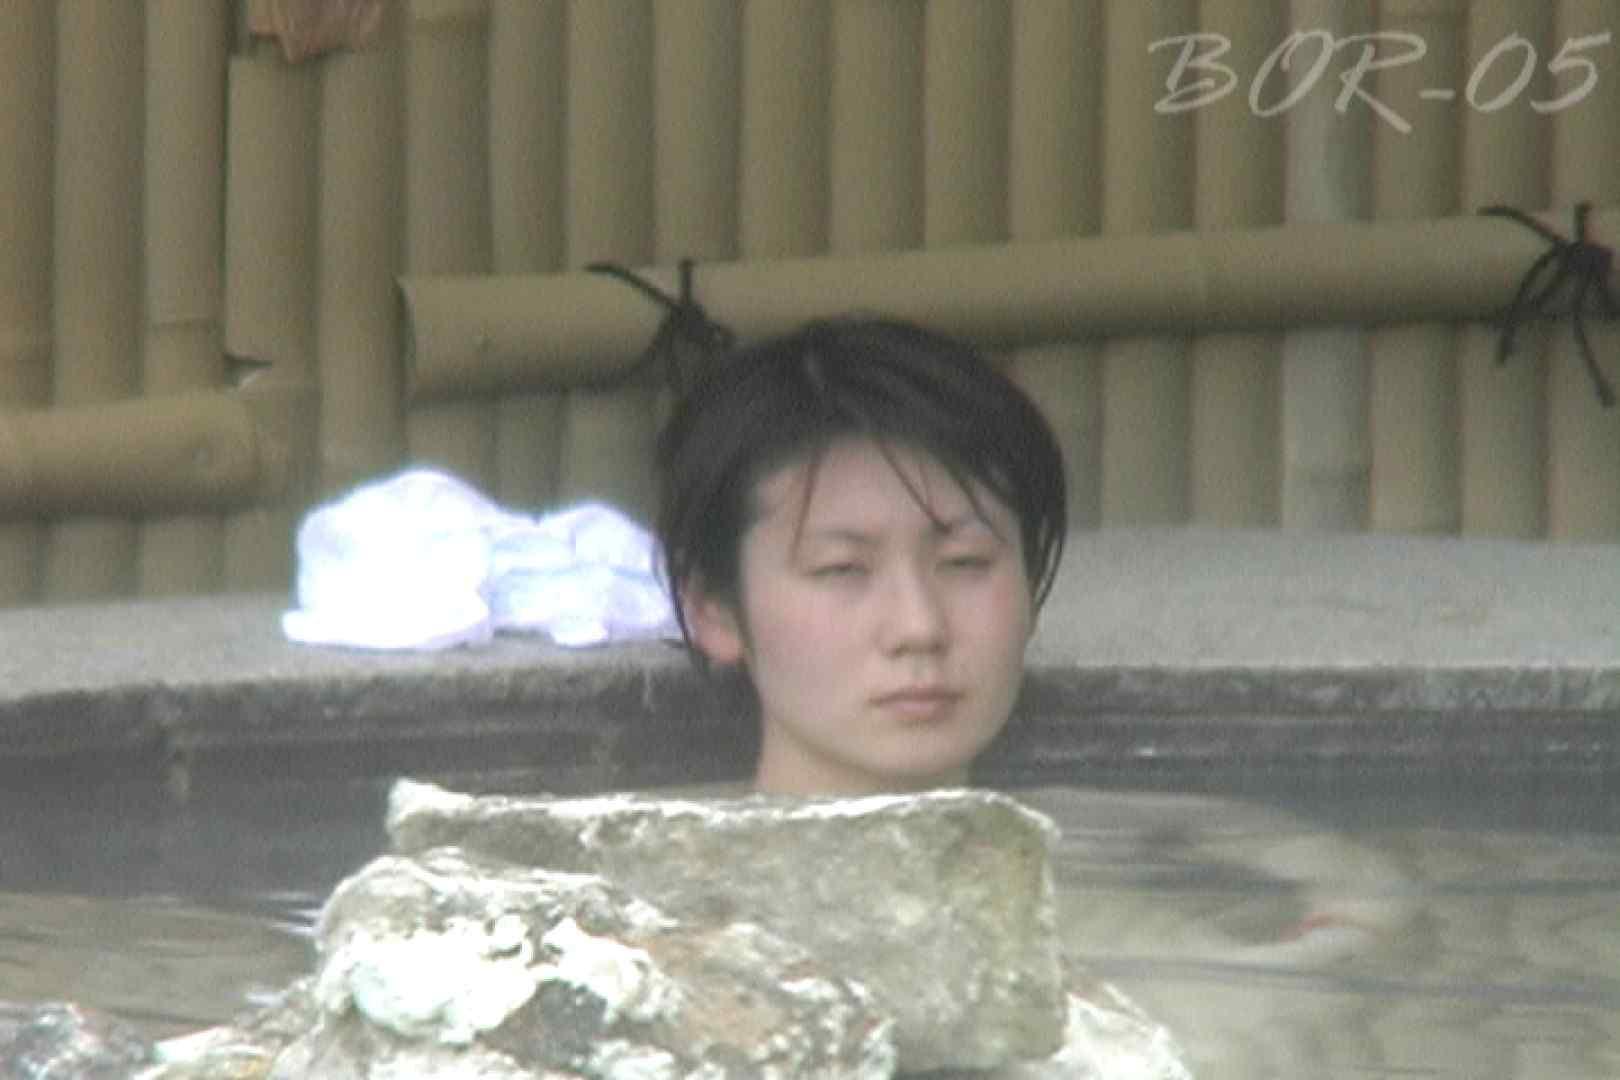 Aquaな露天風呂Vol.493 盗撮 AV無料動画キャプチャ 67PICs 26